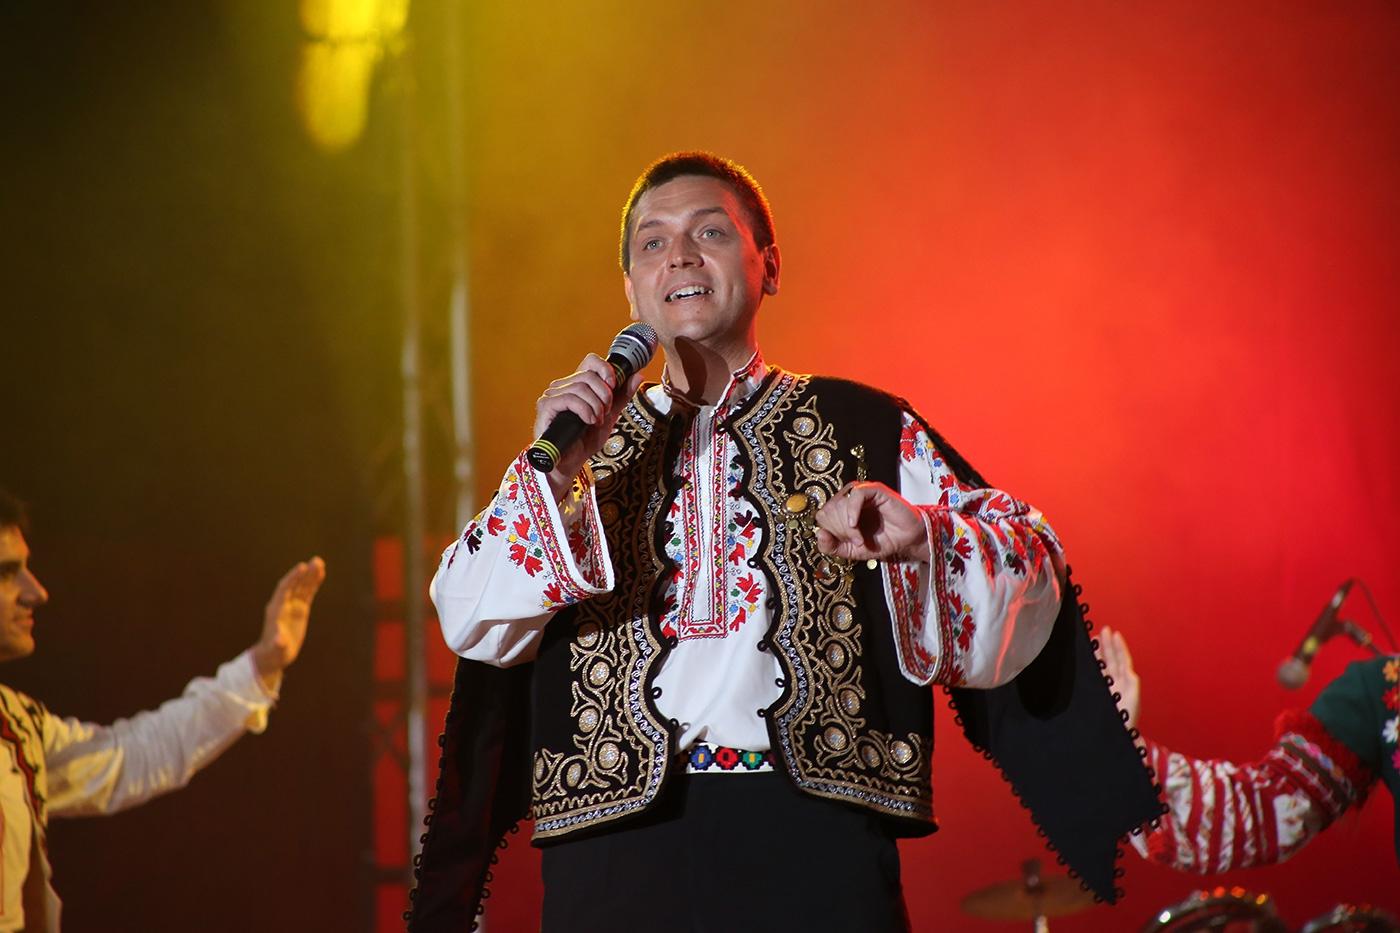 Vasilvalkanov